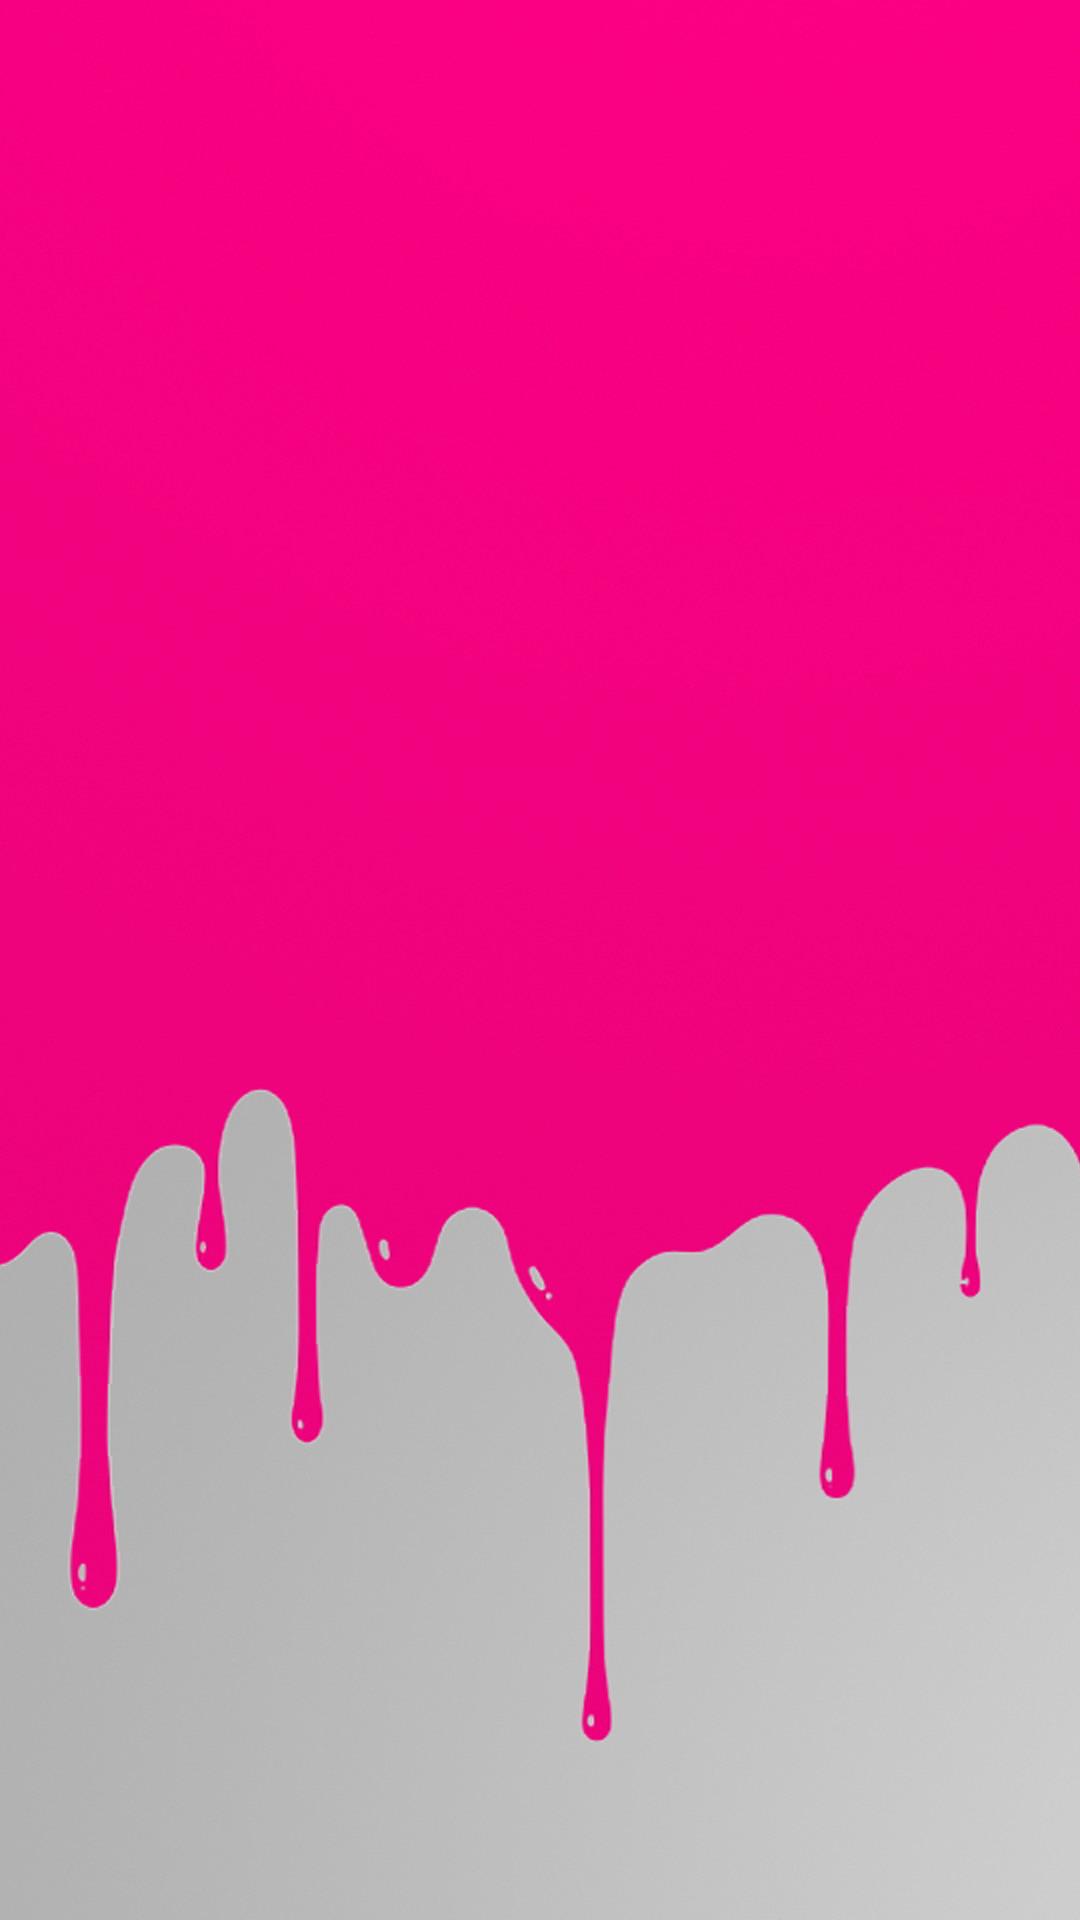 Background Driping Bpink Hd Wallpaper Iphone 6 Plus Cute Hot Pink Background 1080x1920 Download Hd Wallpaper Wallpapertip